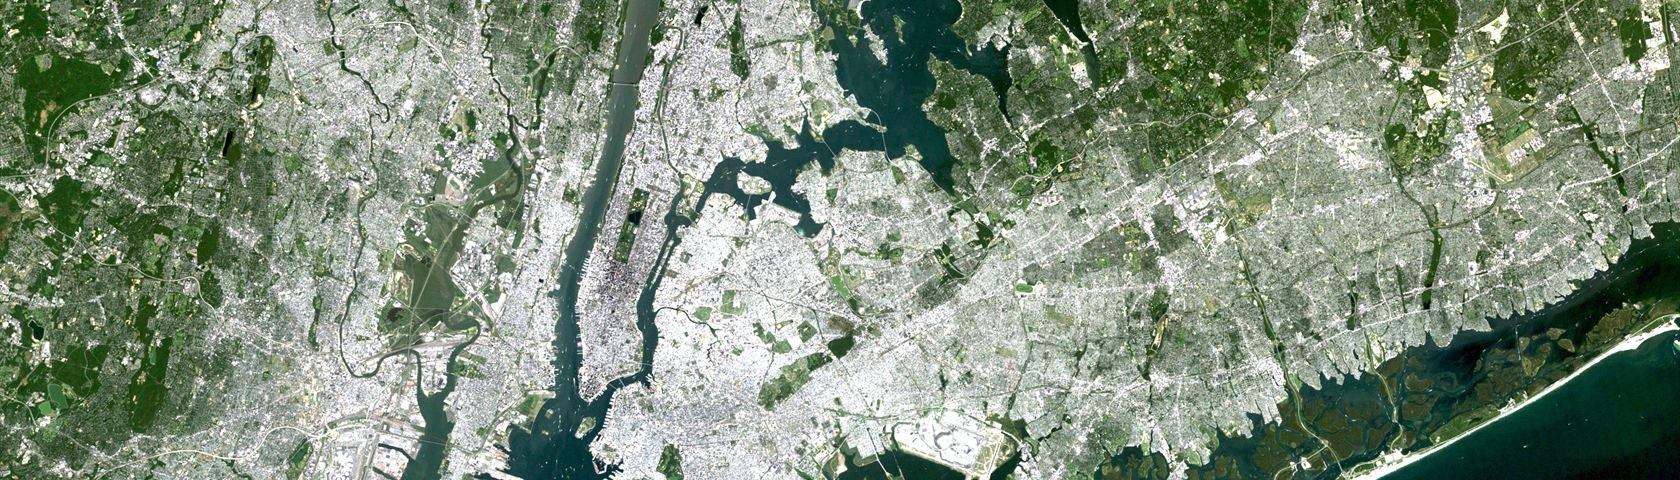 NASA Satellite Captures Super Bowl Cities: New York